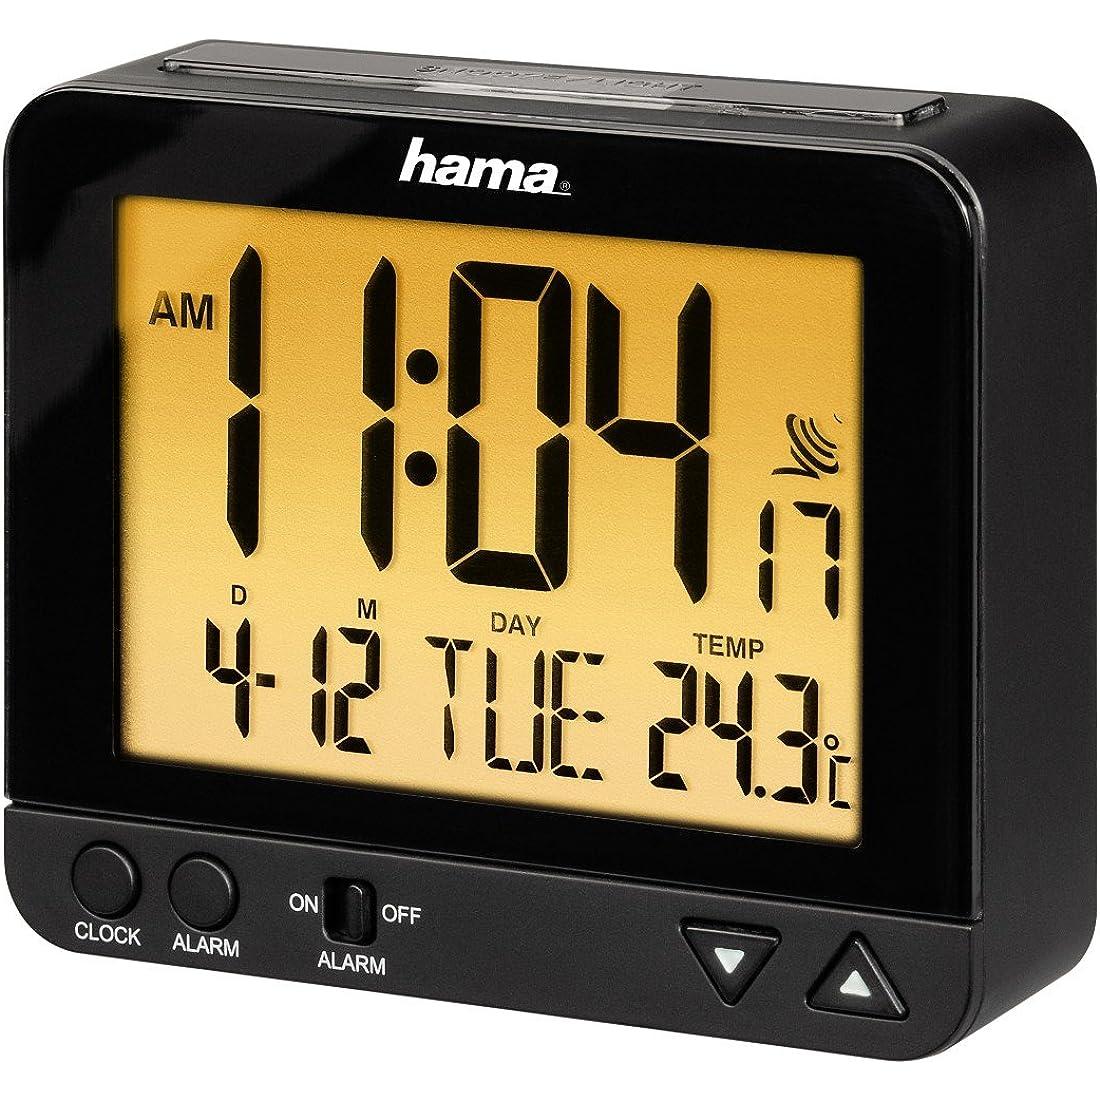 Hama RC550